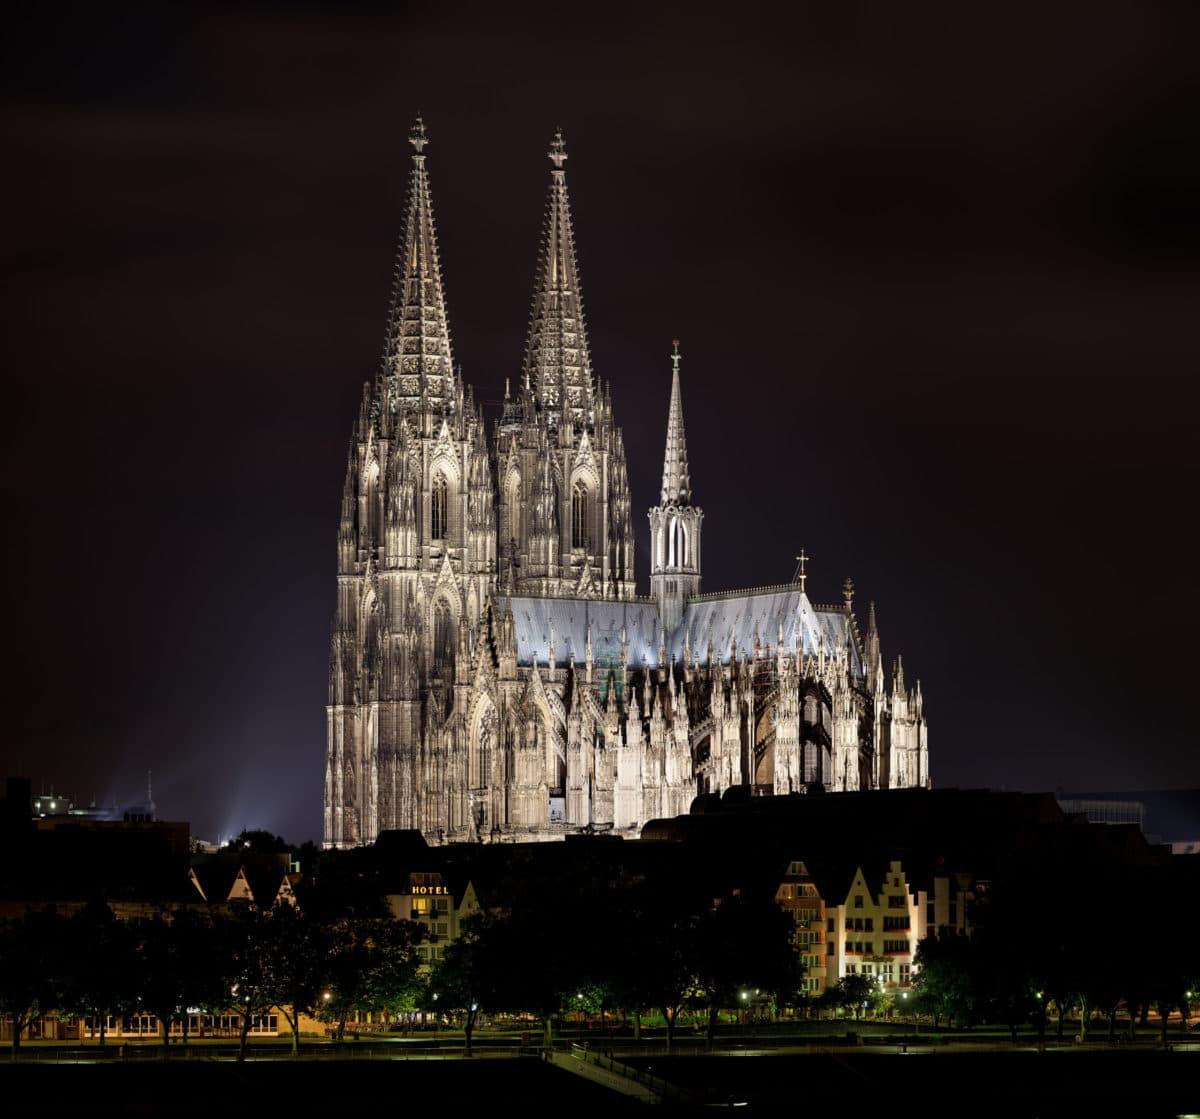 Catedral de Colonia. Foto: Thomas Wolf, www.foto-tw.de (CC BY-SA 3.0 DE)